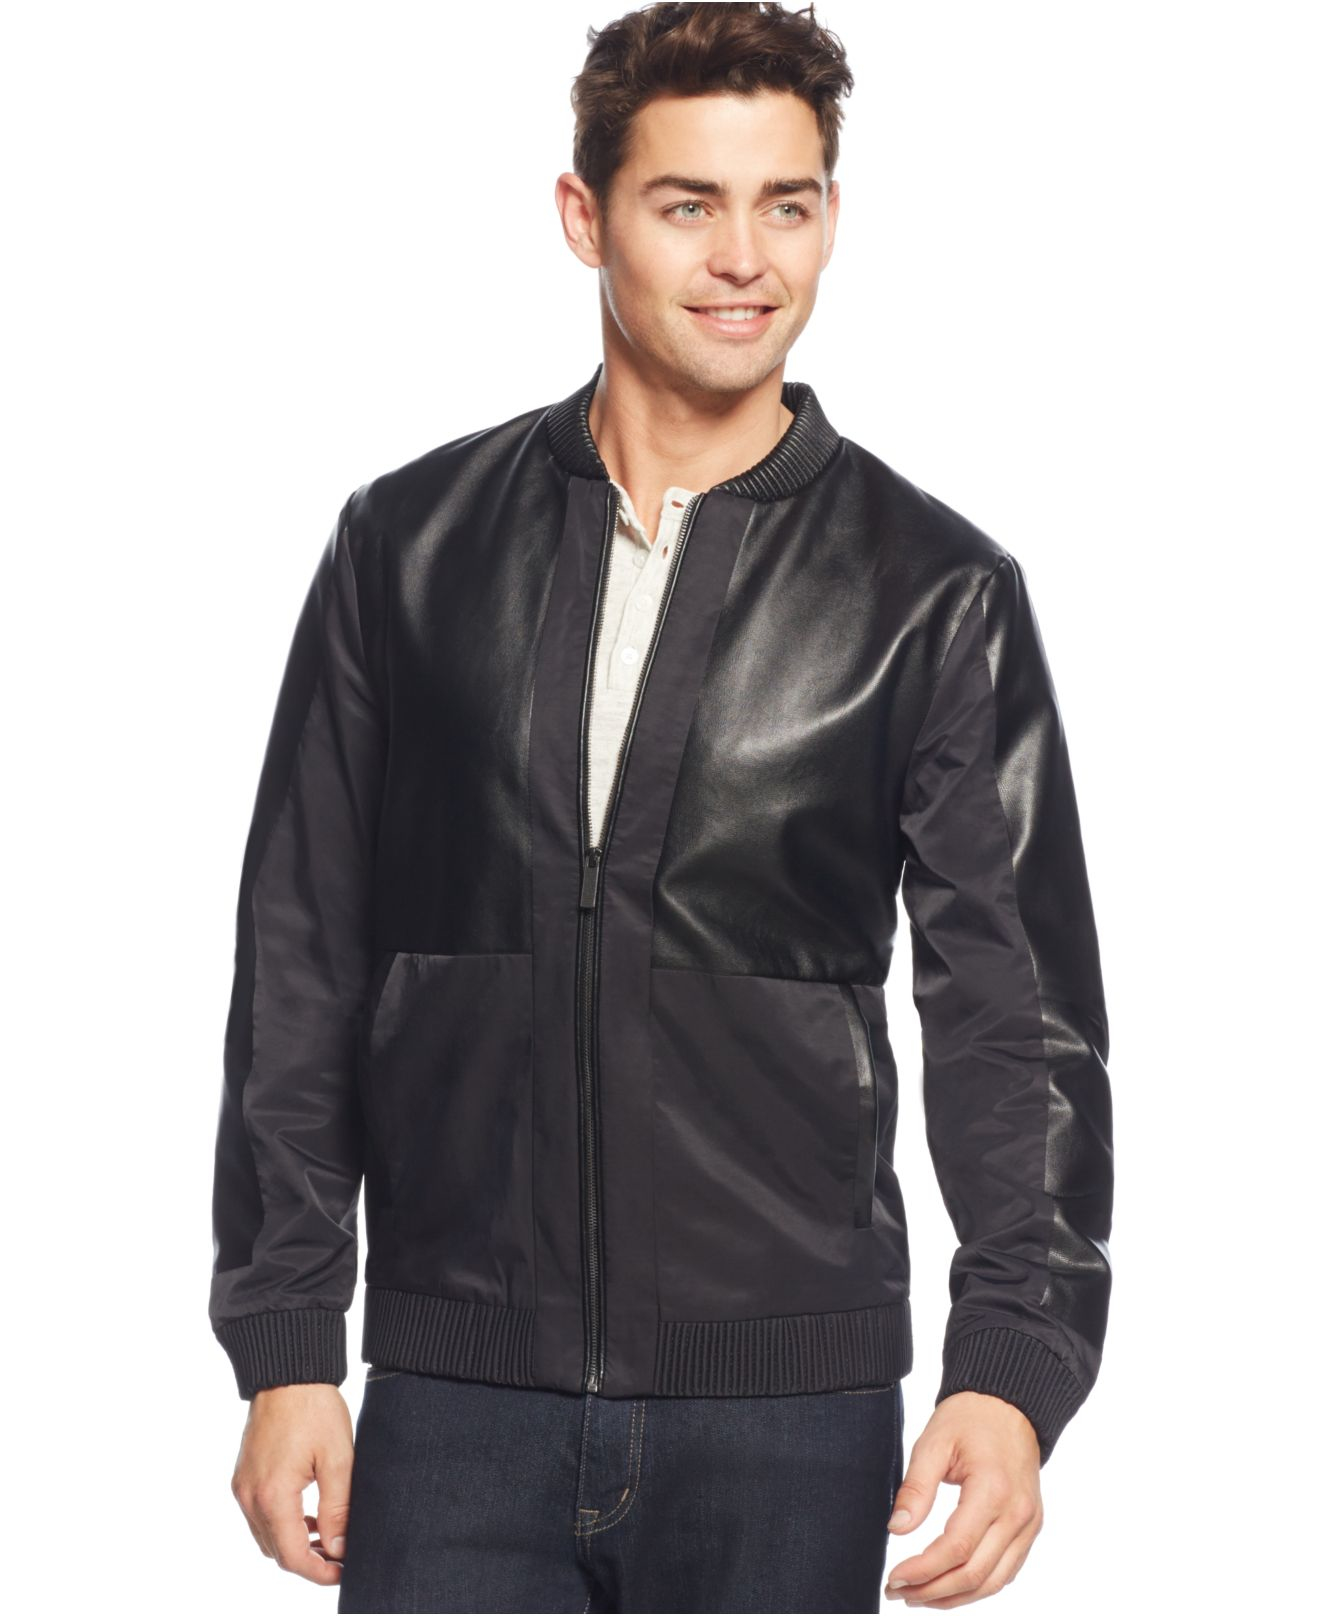 Calvin Klein Mixed Media Bomber Jacket In Black For Men Lyst